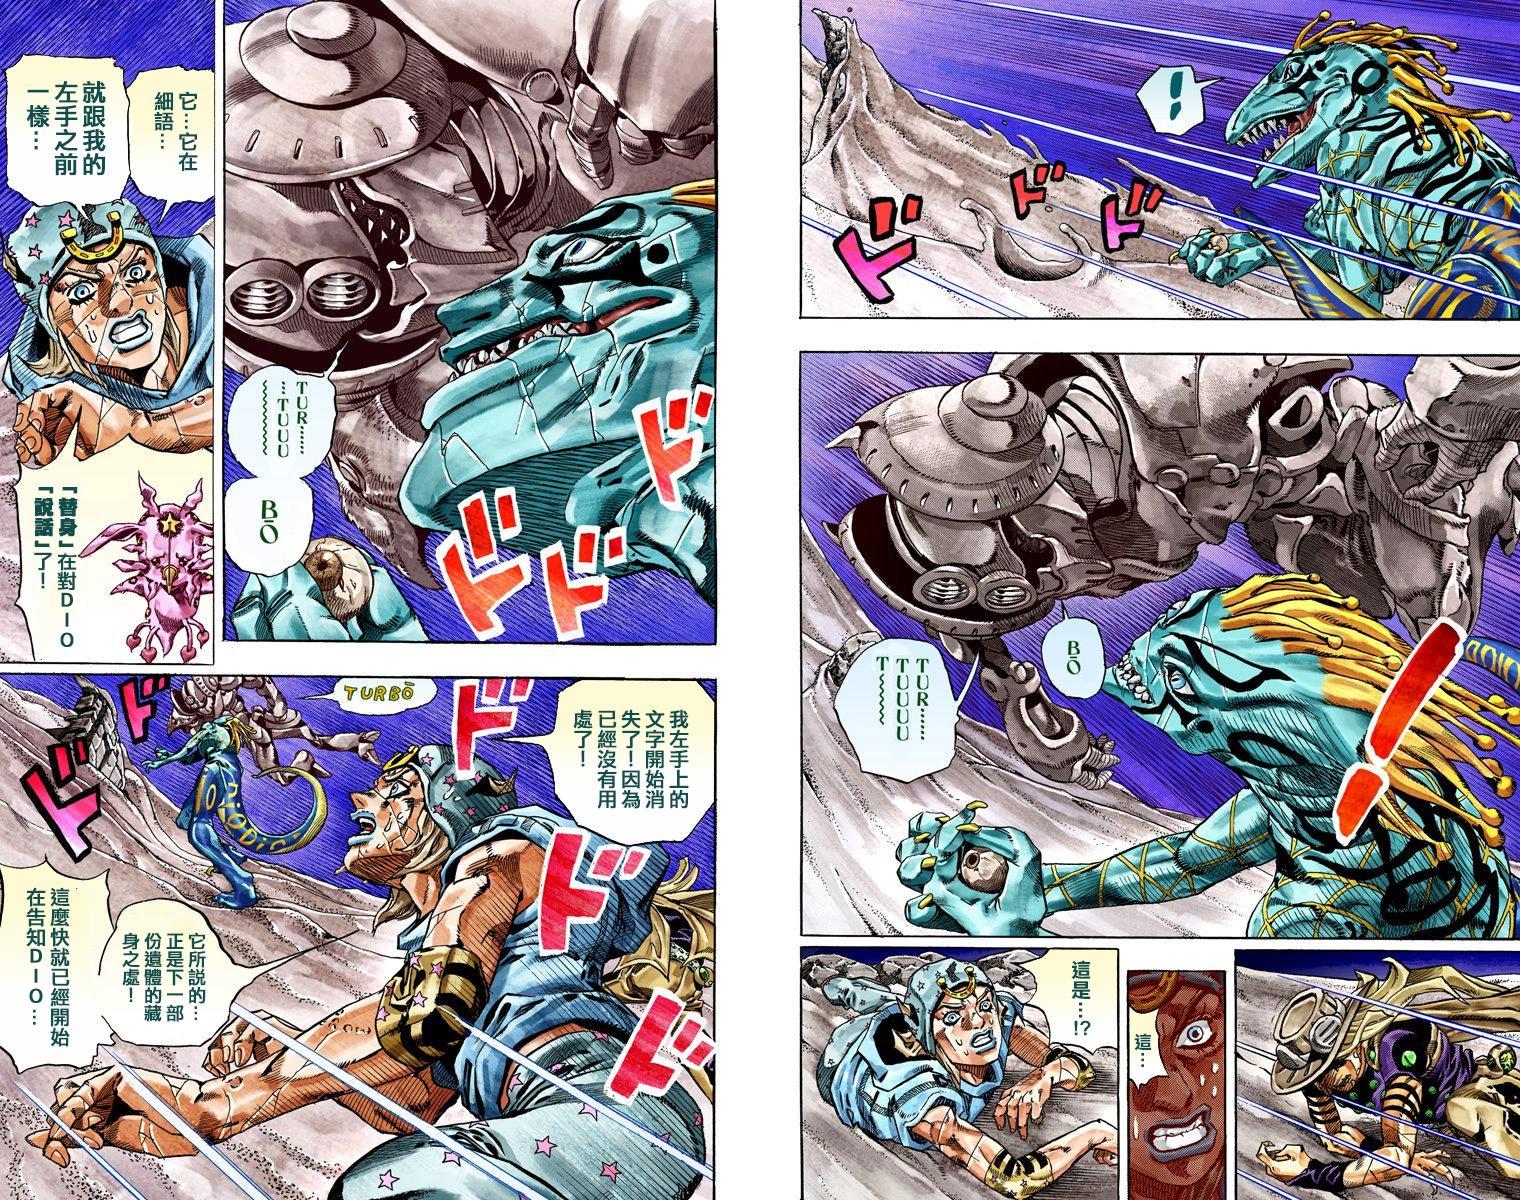 JoJo的奇妙冒險第07部漫畫JoJo的奇妙冒險第07部 第7卷(第3頁)劇情-二次元動漫